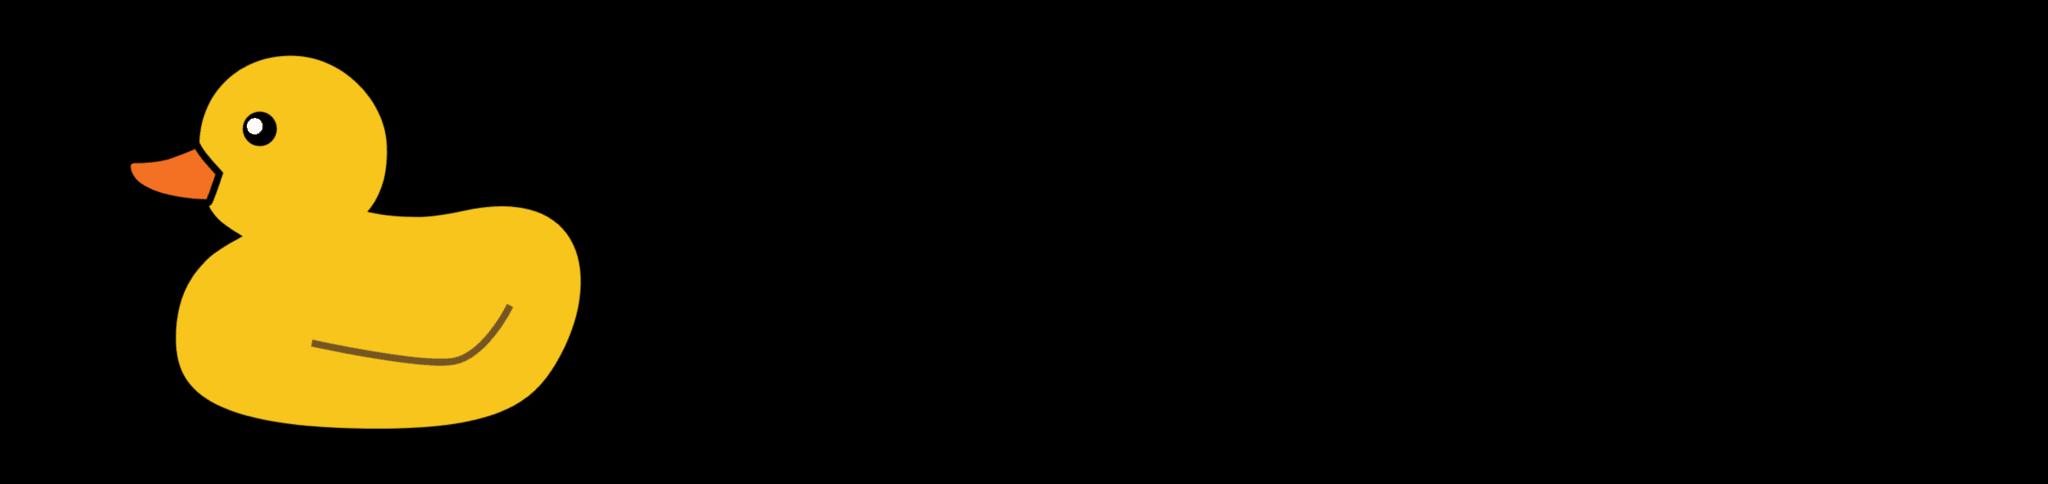 Duxery logo